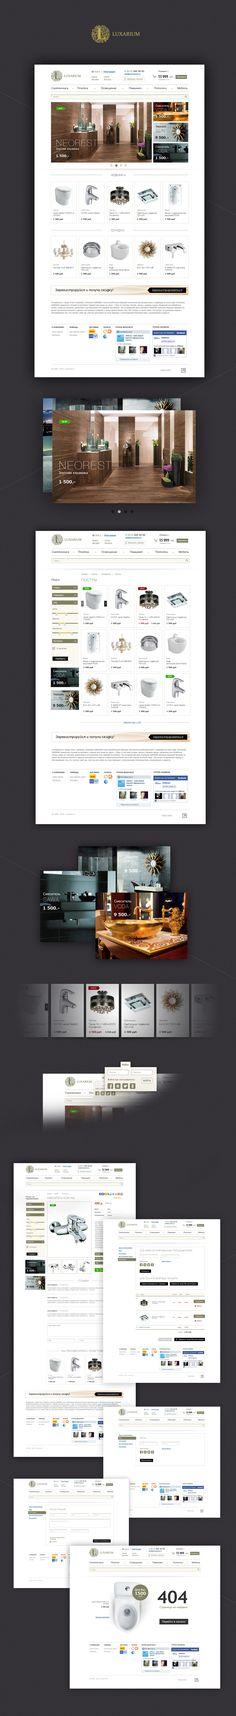 Luxarium - интернет-магазин  Site © Михил Соловьев